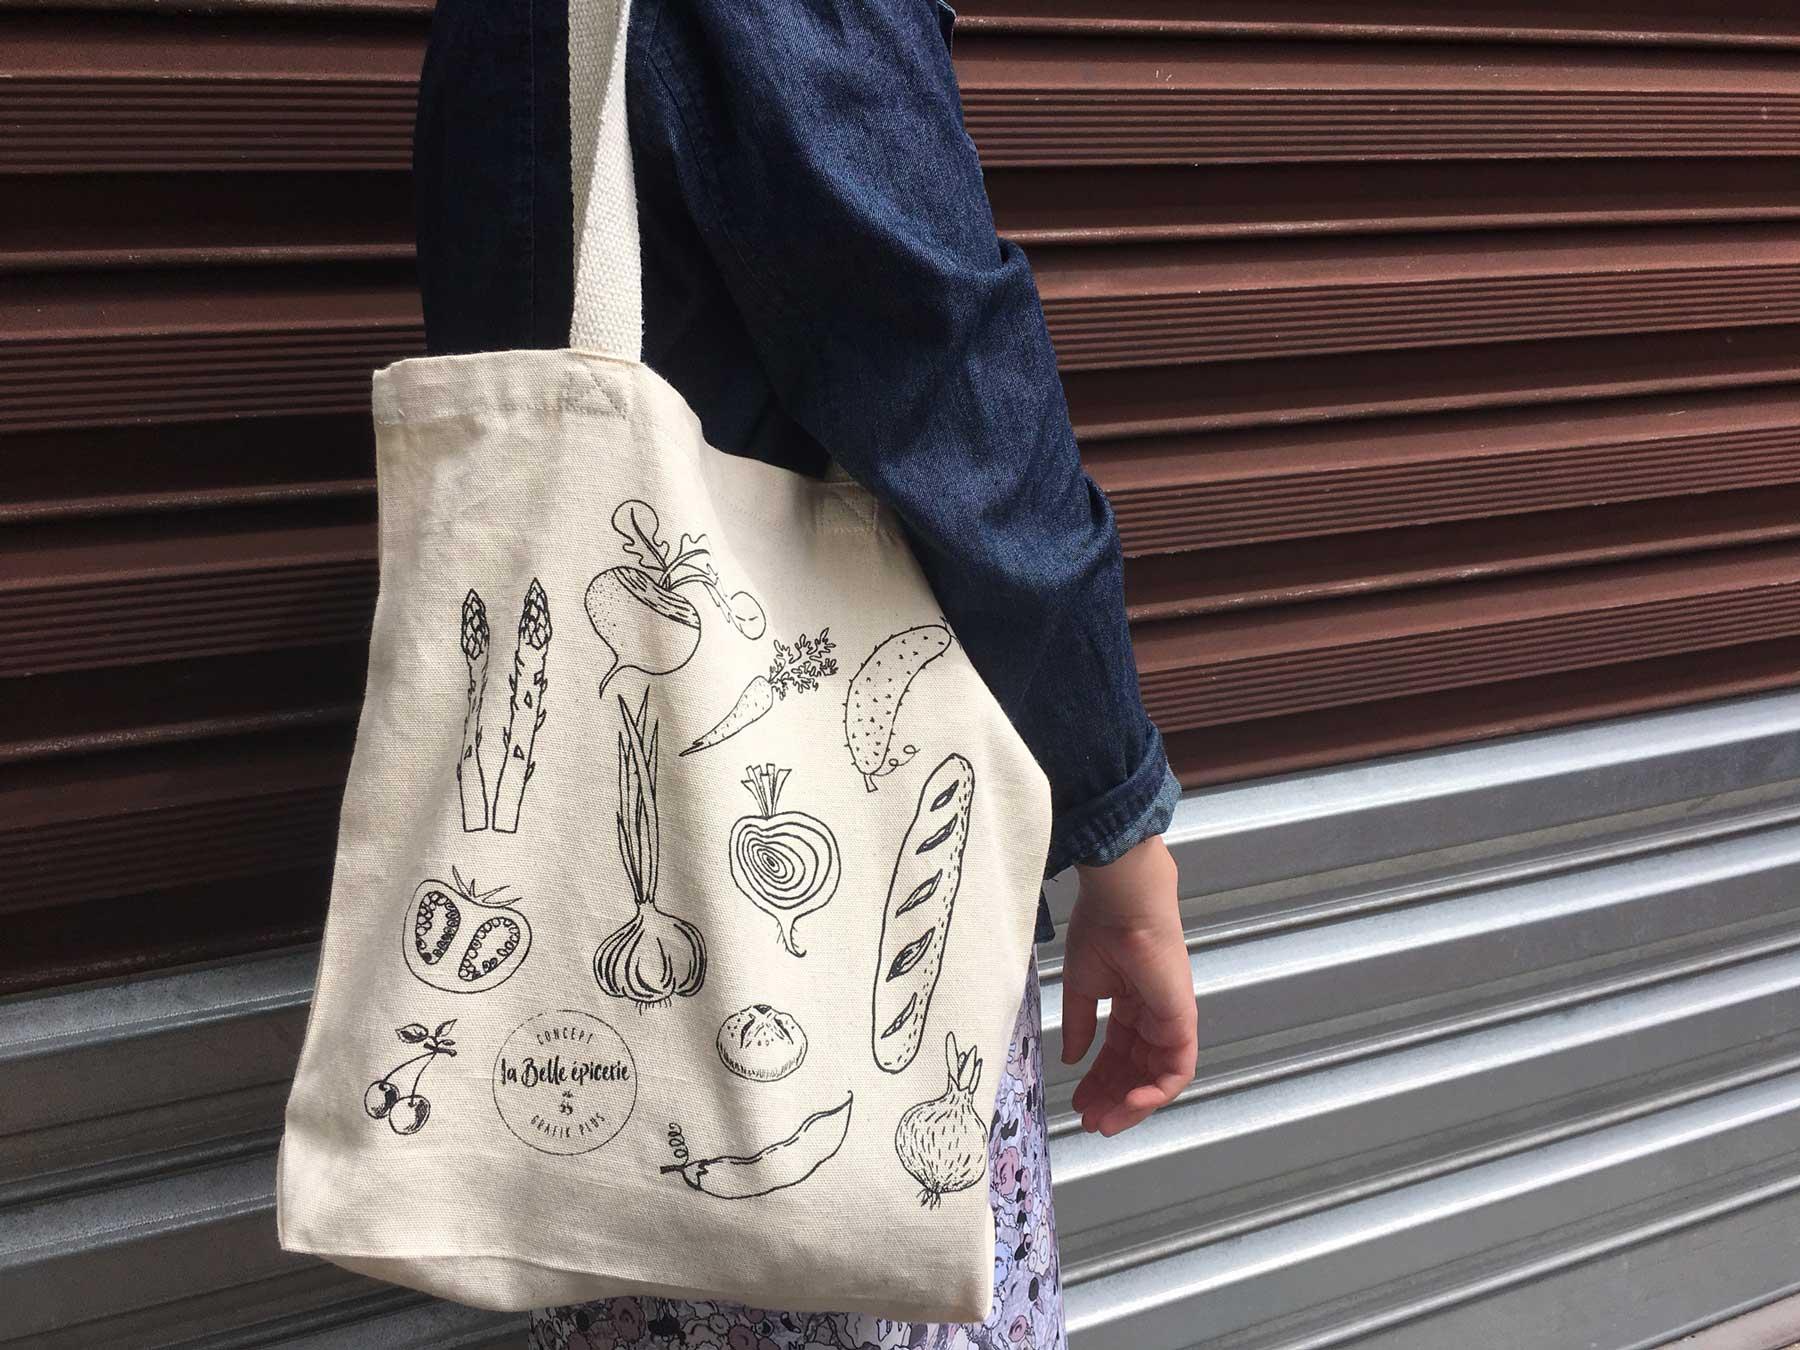 tote-bag-design-bad-kitty.jpg